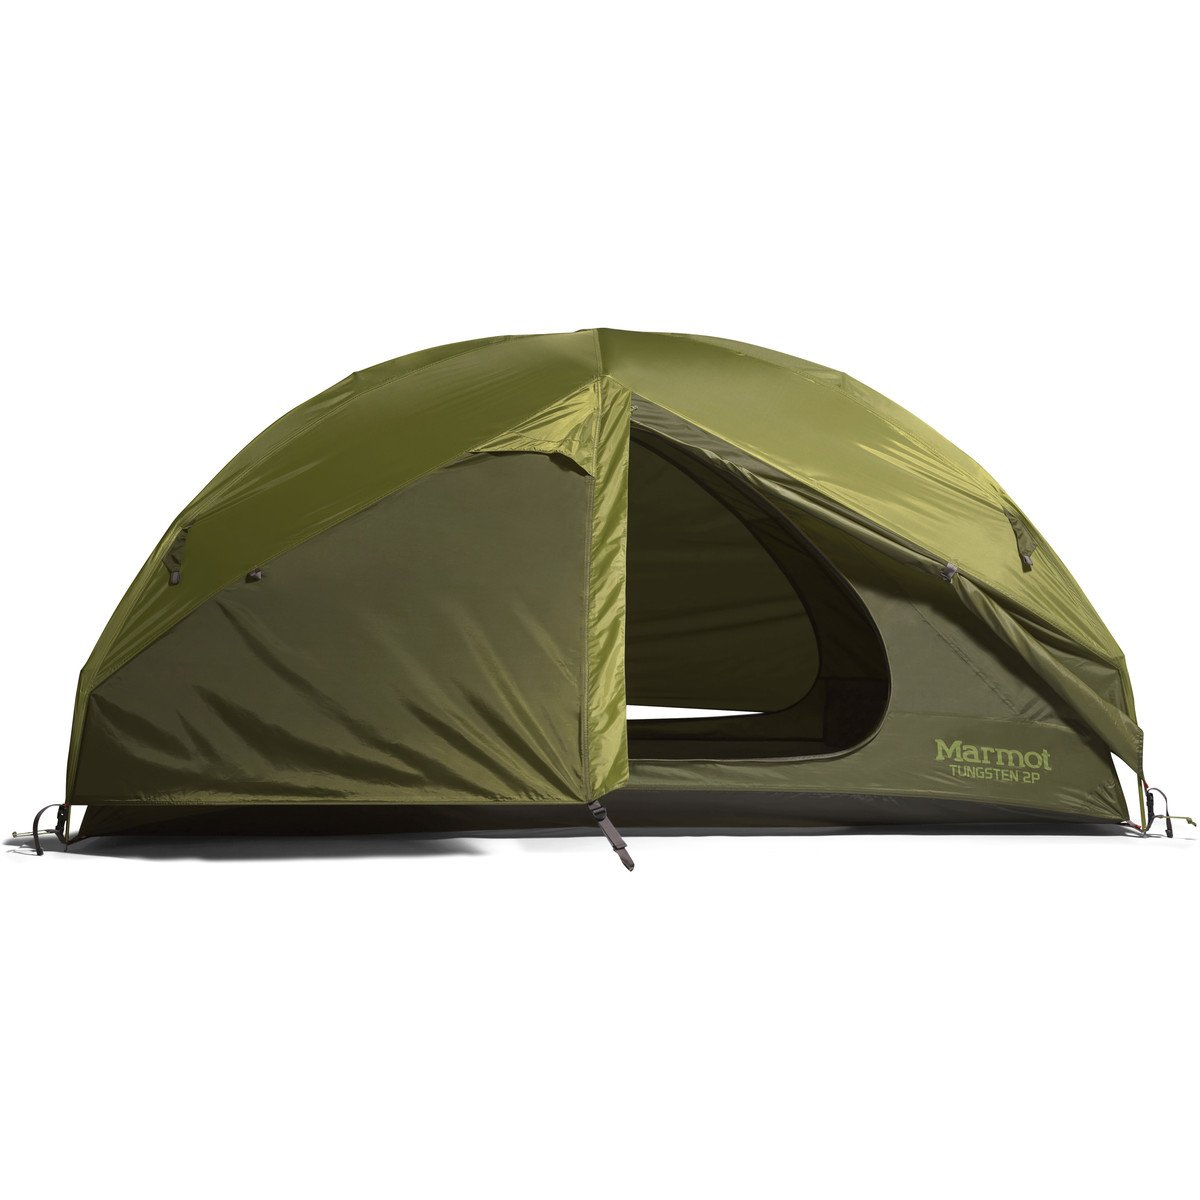 Amazon.com Marmot Tungsten 2P Backpacking Tent-2 Person-Blaze Orange Sports u0026 Outdoors  sc 1 st  Amazon.com & Amazon.com: Marmot Tungsten 2P Backpacking Tent-2 Person-Blaze ...